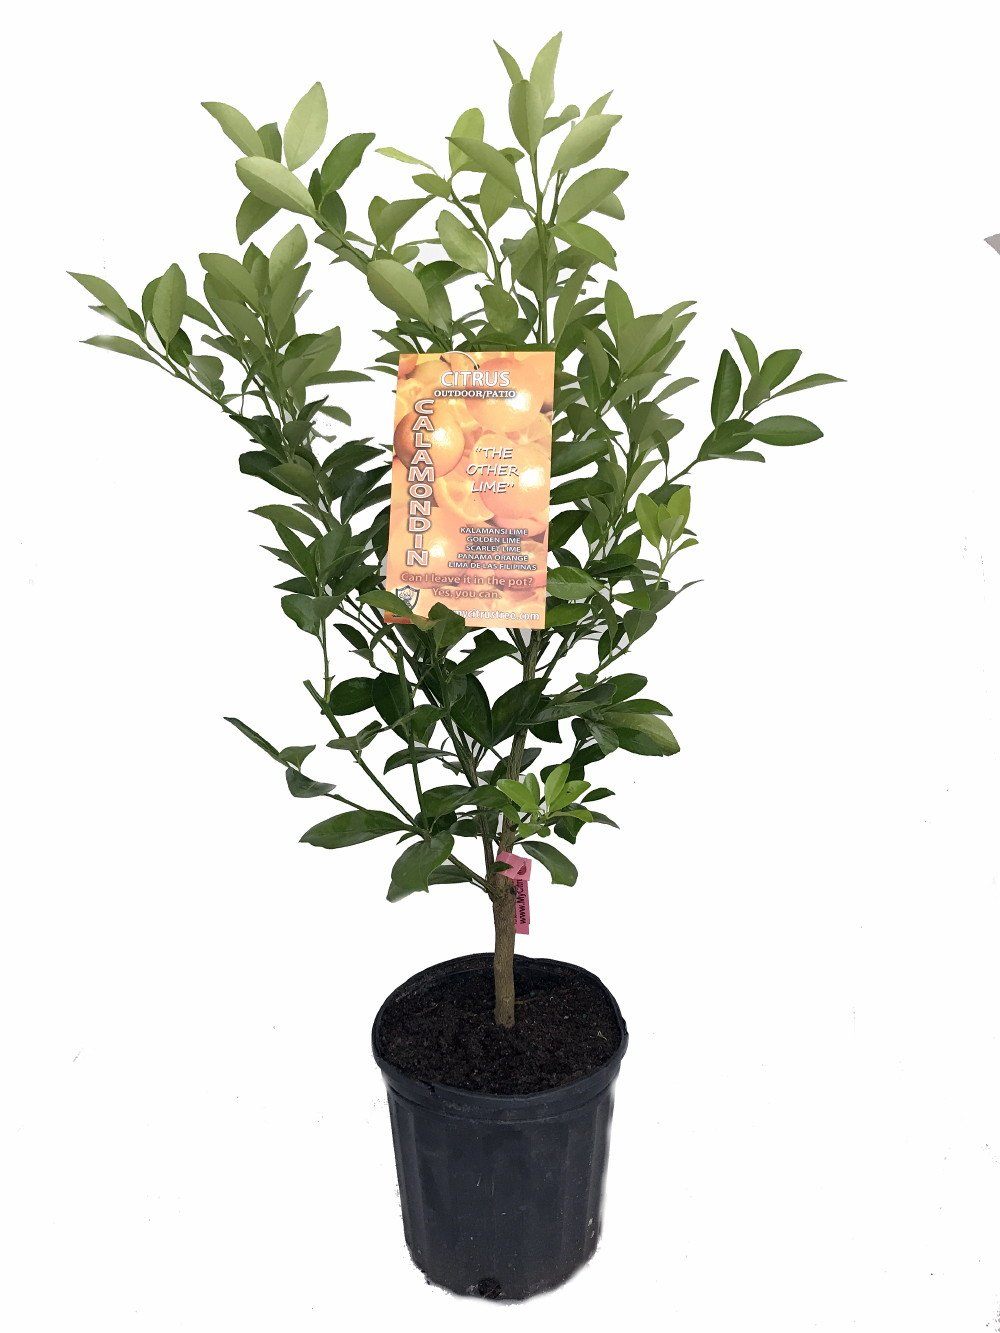 Panama Orange Tree - Calamondin- Citrus mitis - 6'' Pot - No Ship to CA,FL,TX, AZ